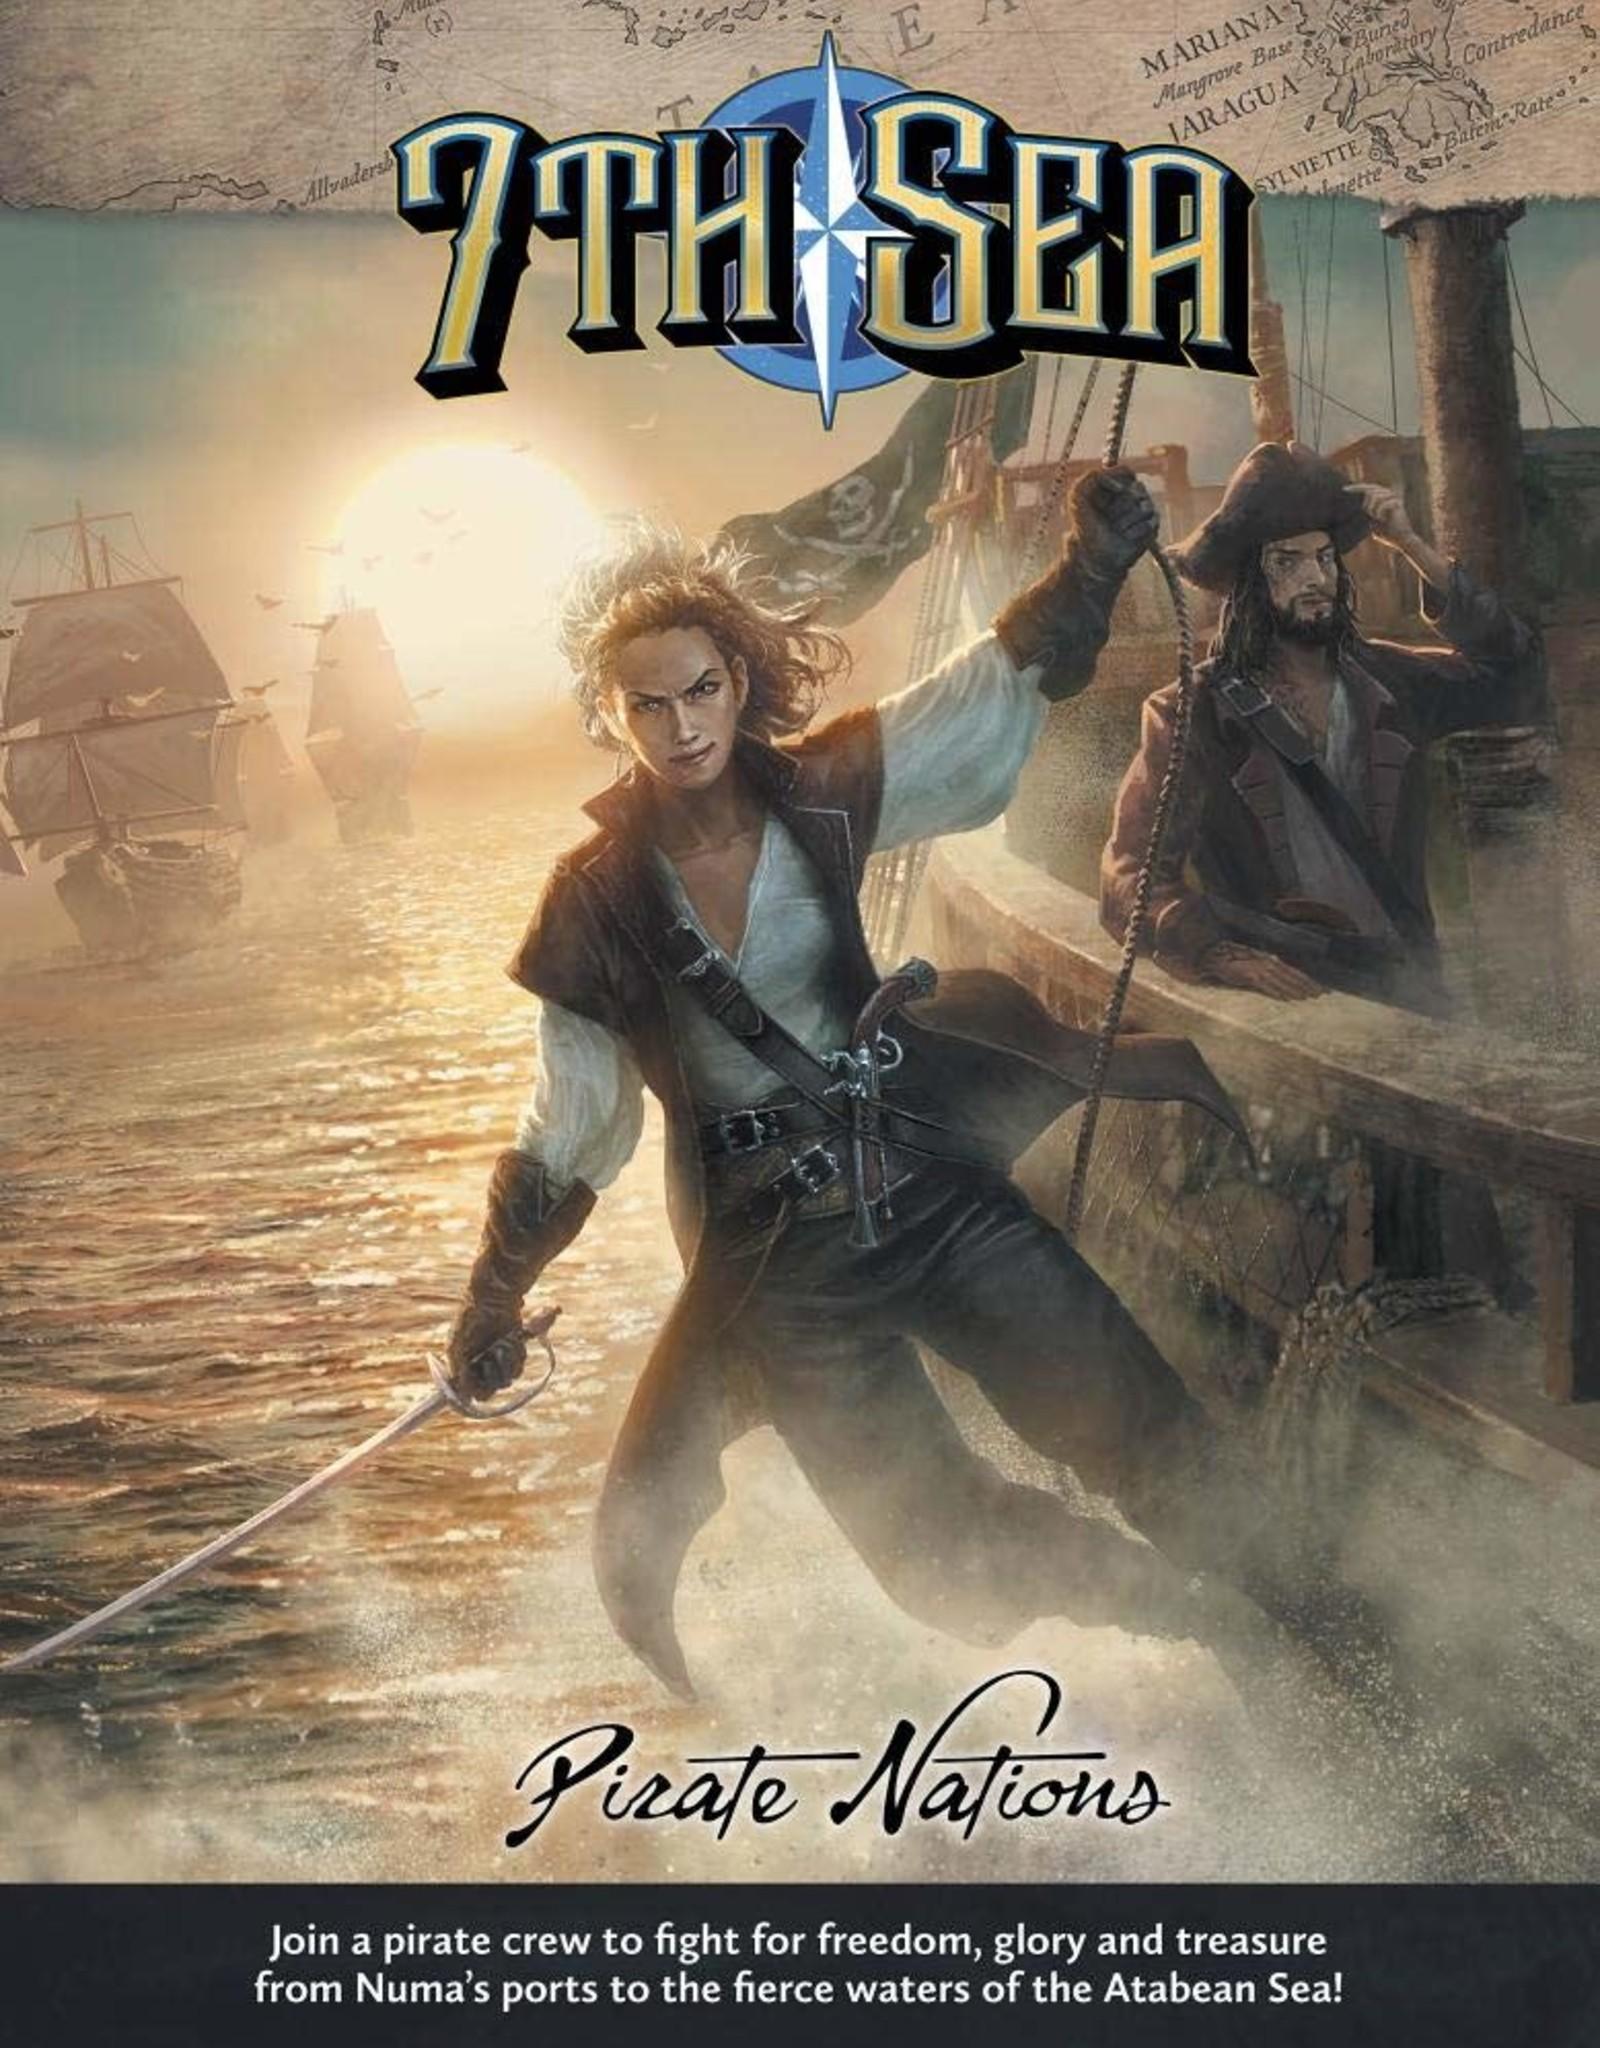 7th Sea: Pirate Nations